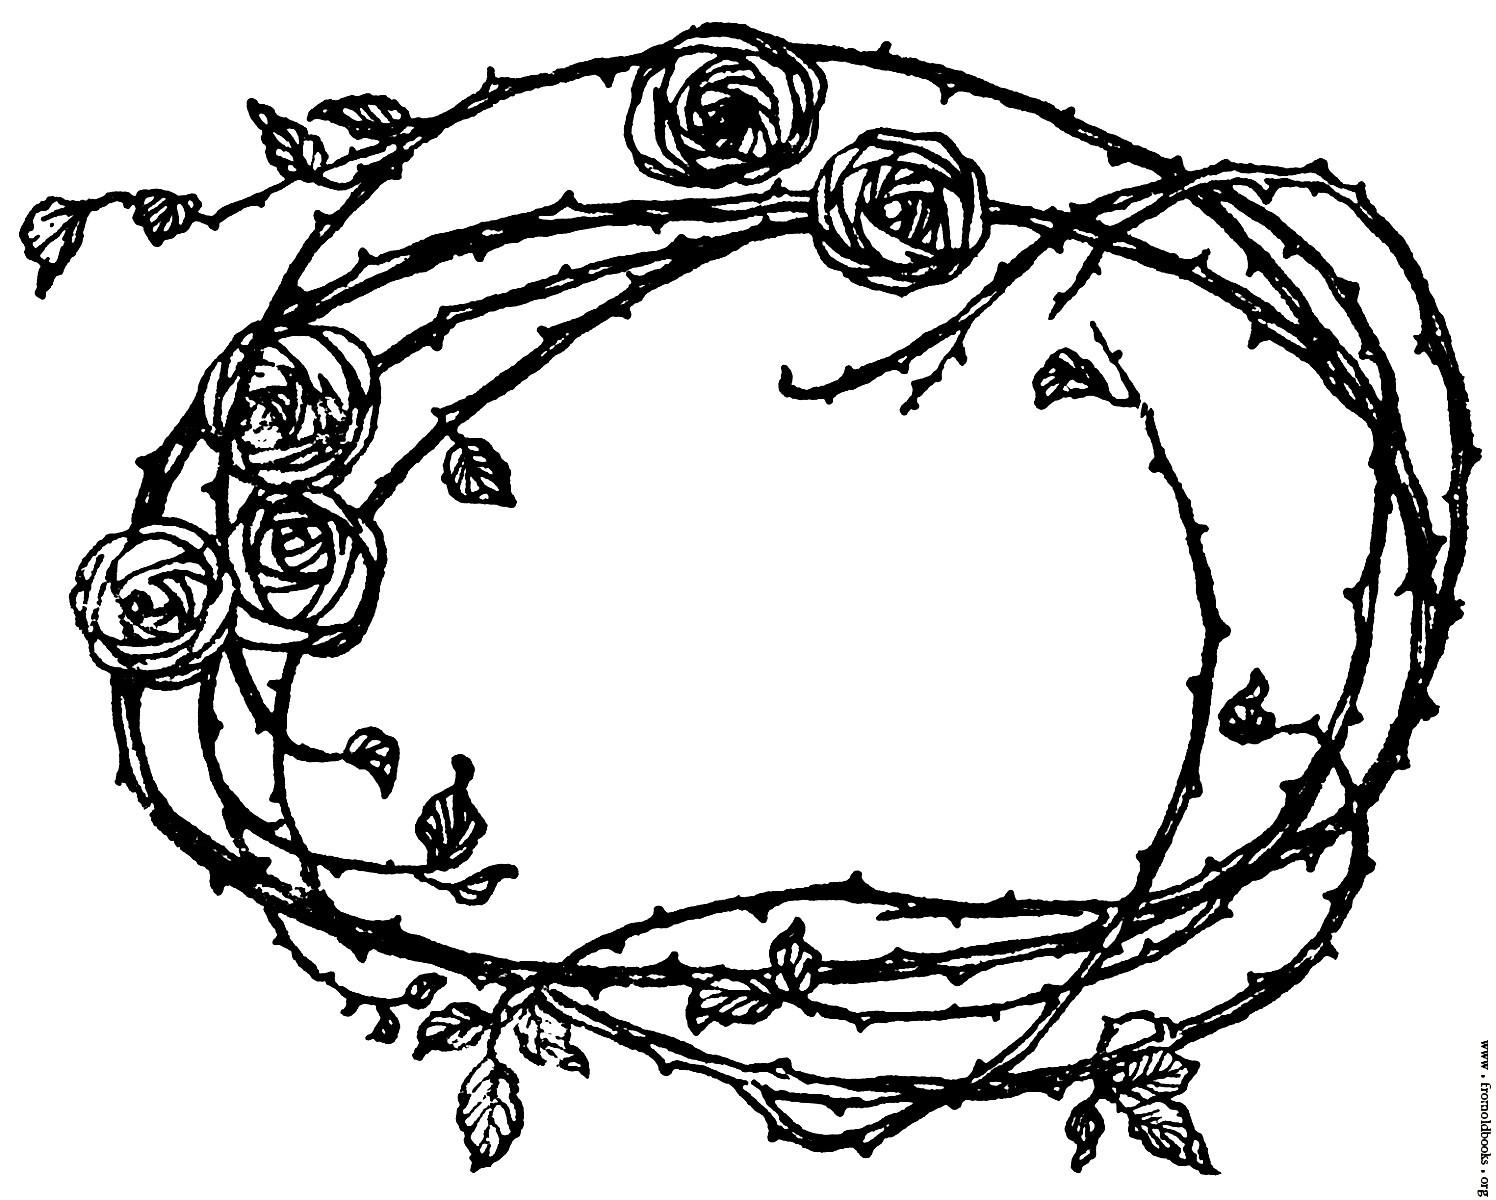 Drawn rose bush border Of Roses and Tatting Border